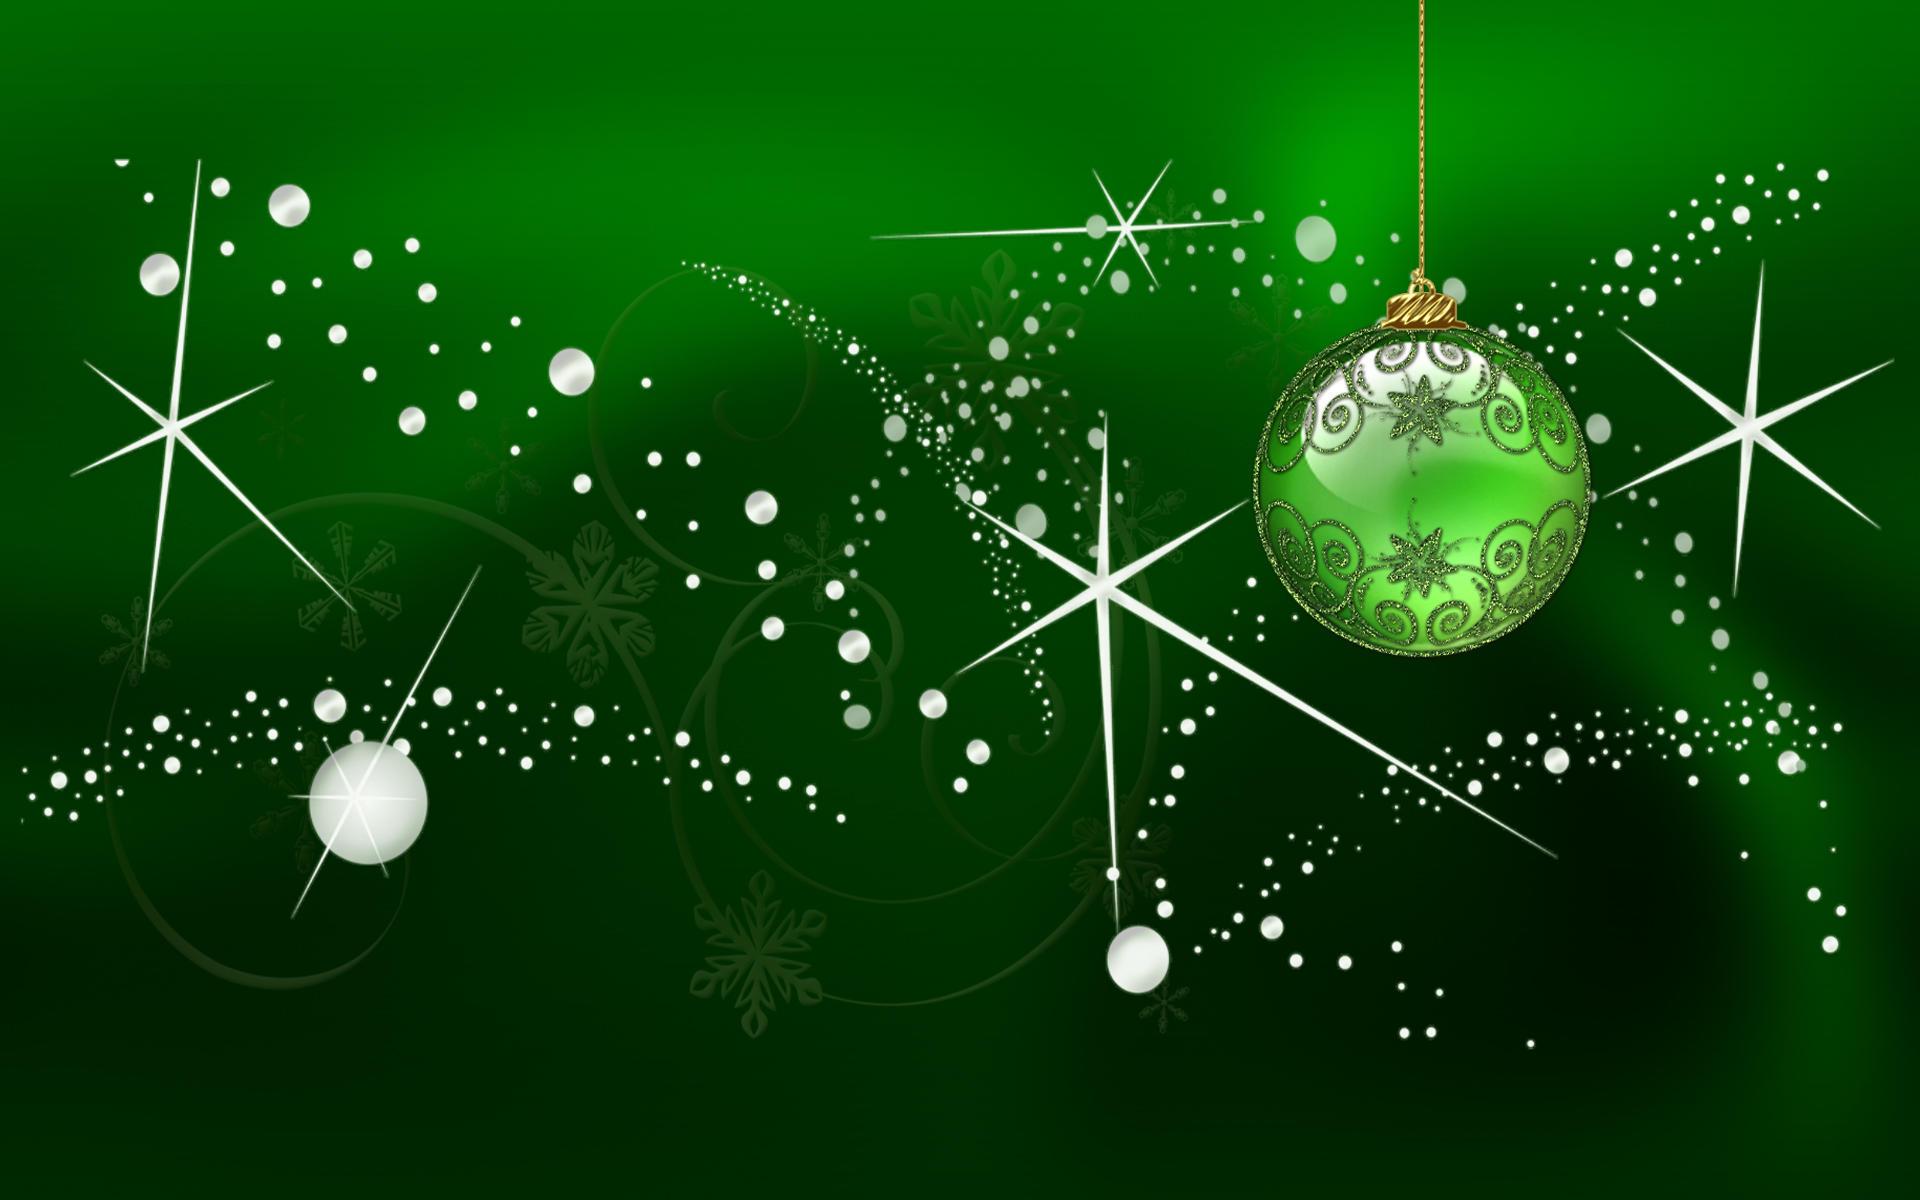 green christmas wallpaper - photo #6